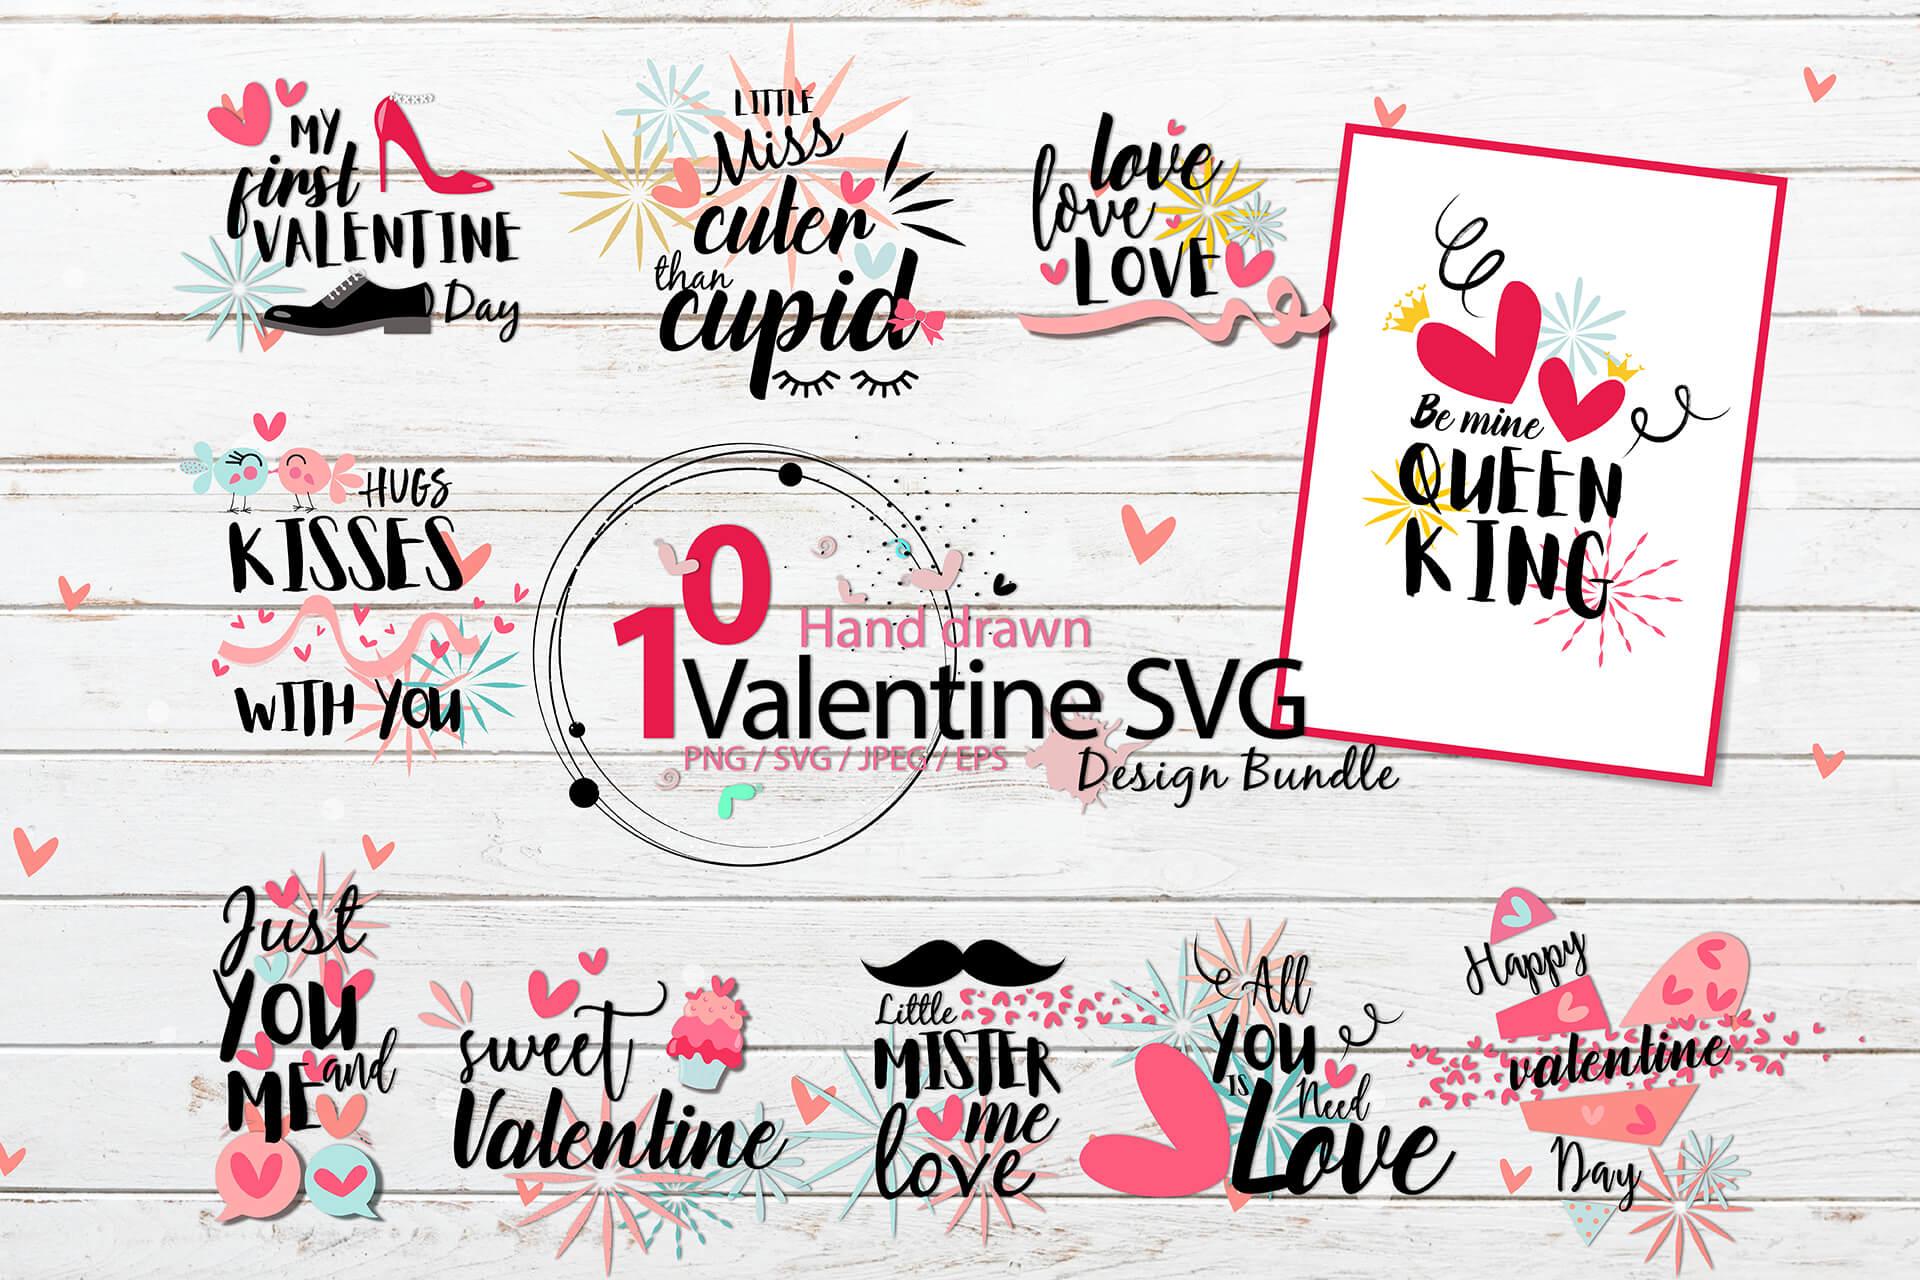 Hand drawn Valentine SVG Design Bundle example image 1